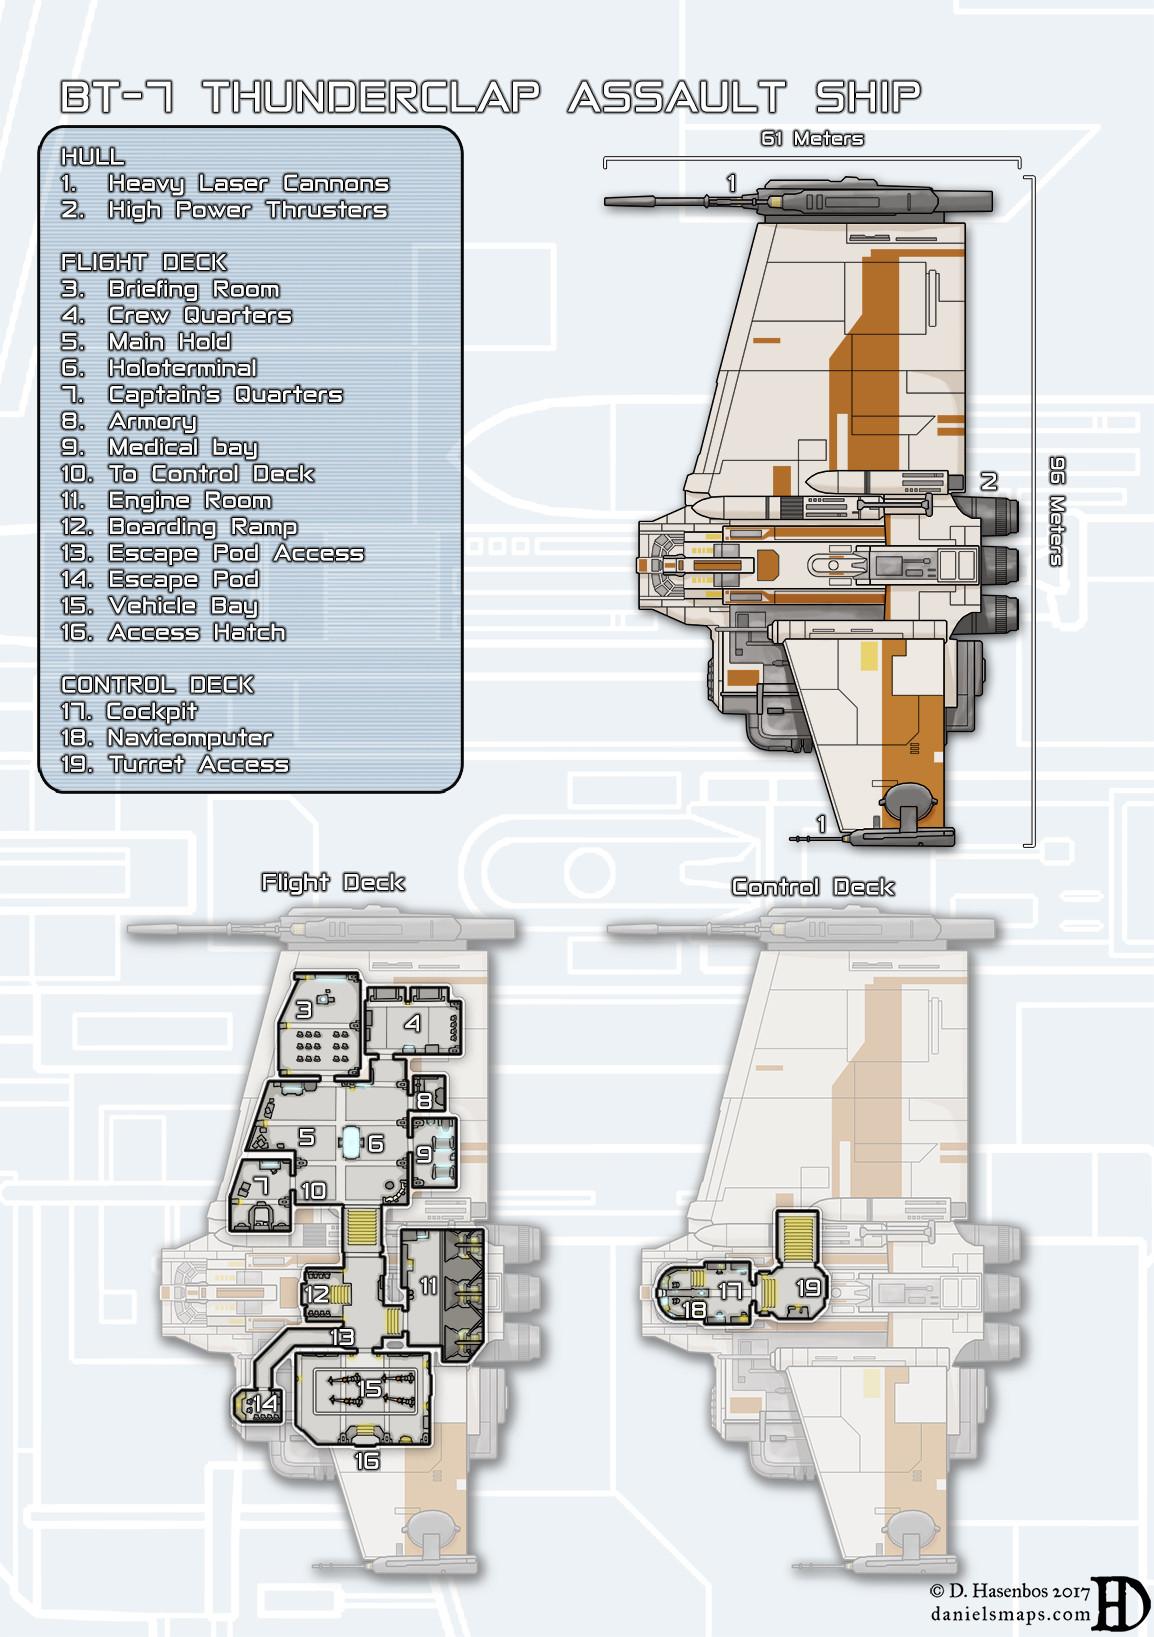 hight resolution of bt 7 thunderclap assault ship